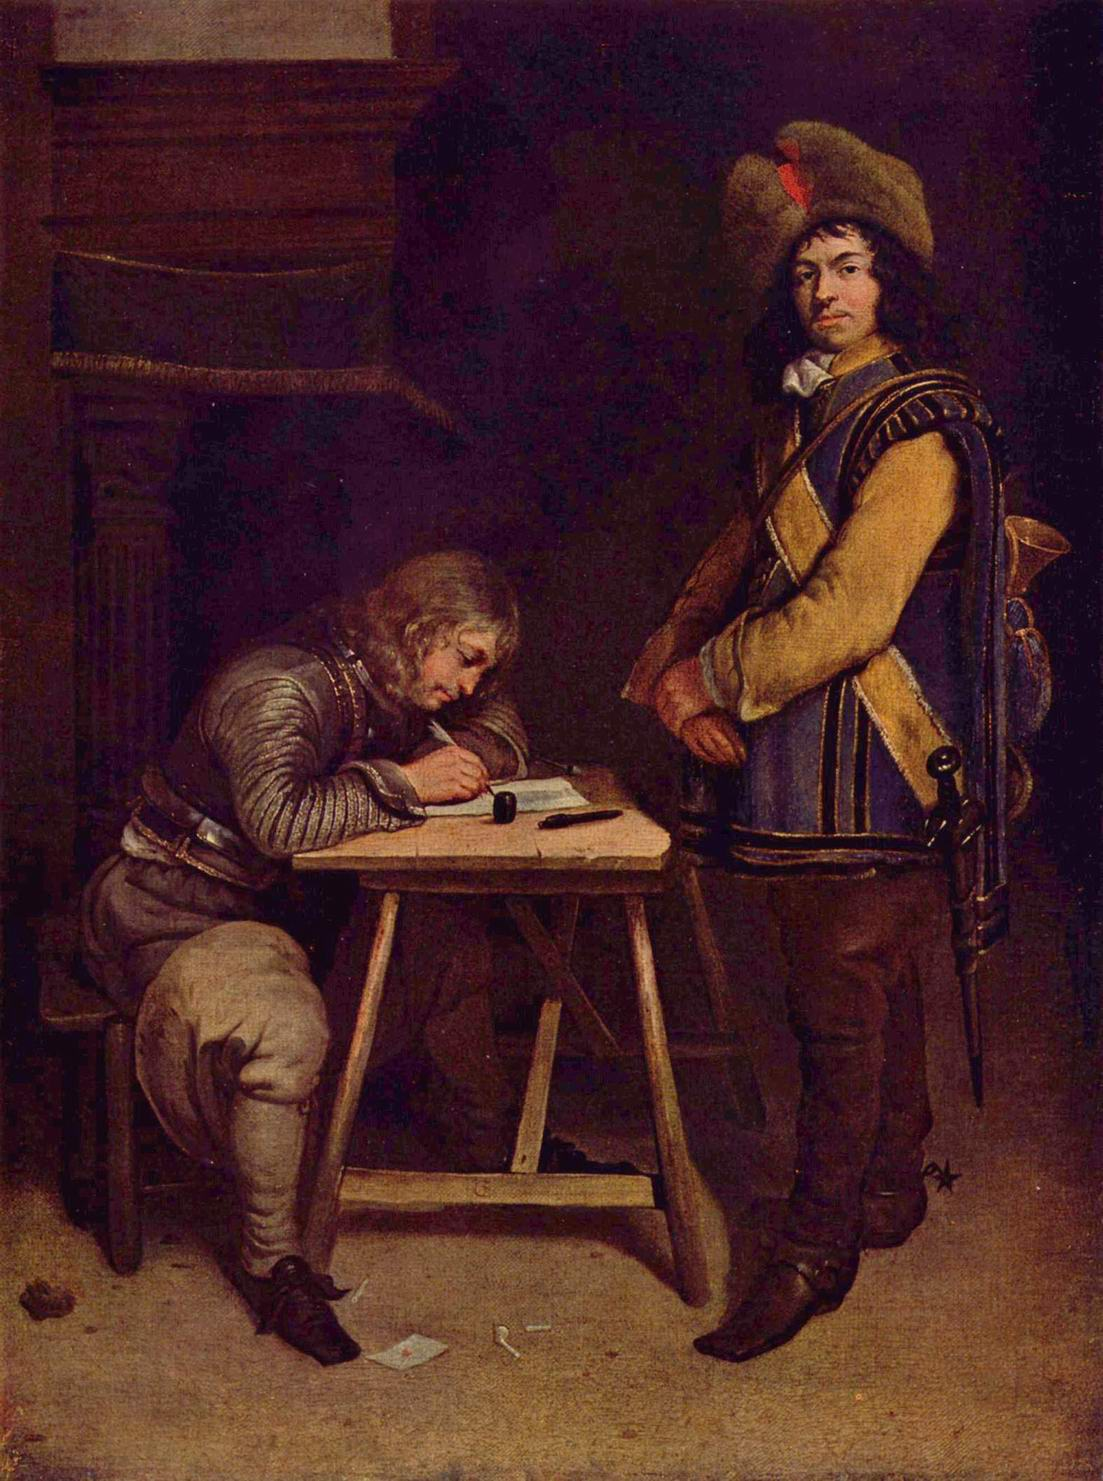 Офицер, пишущий письмо, Герард тер Борх Младший